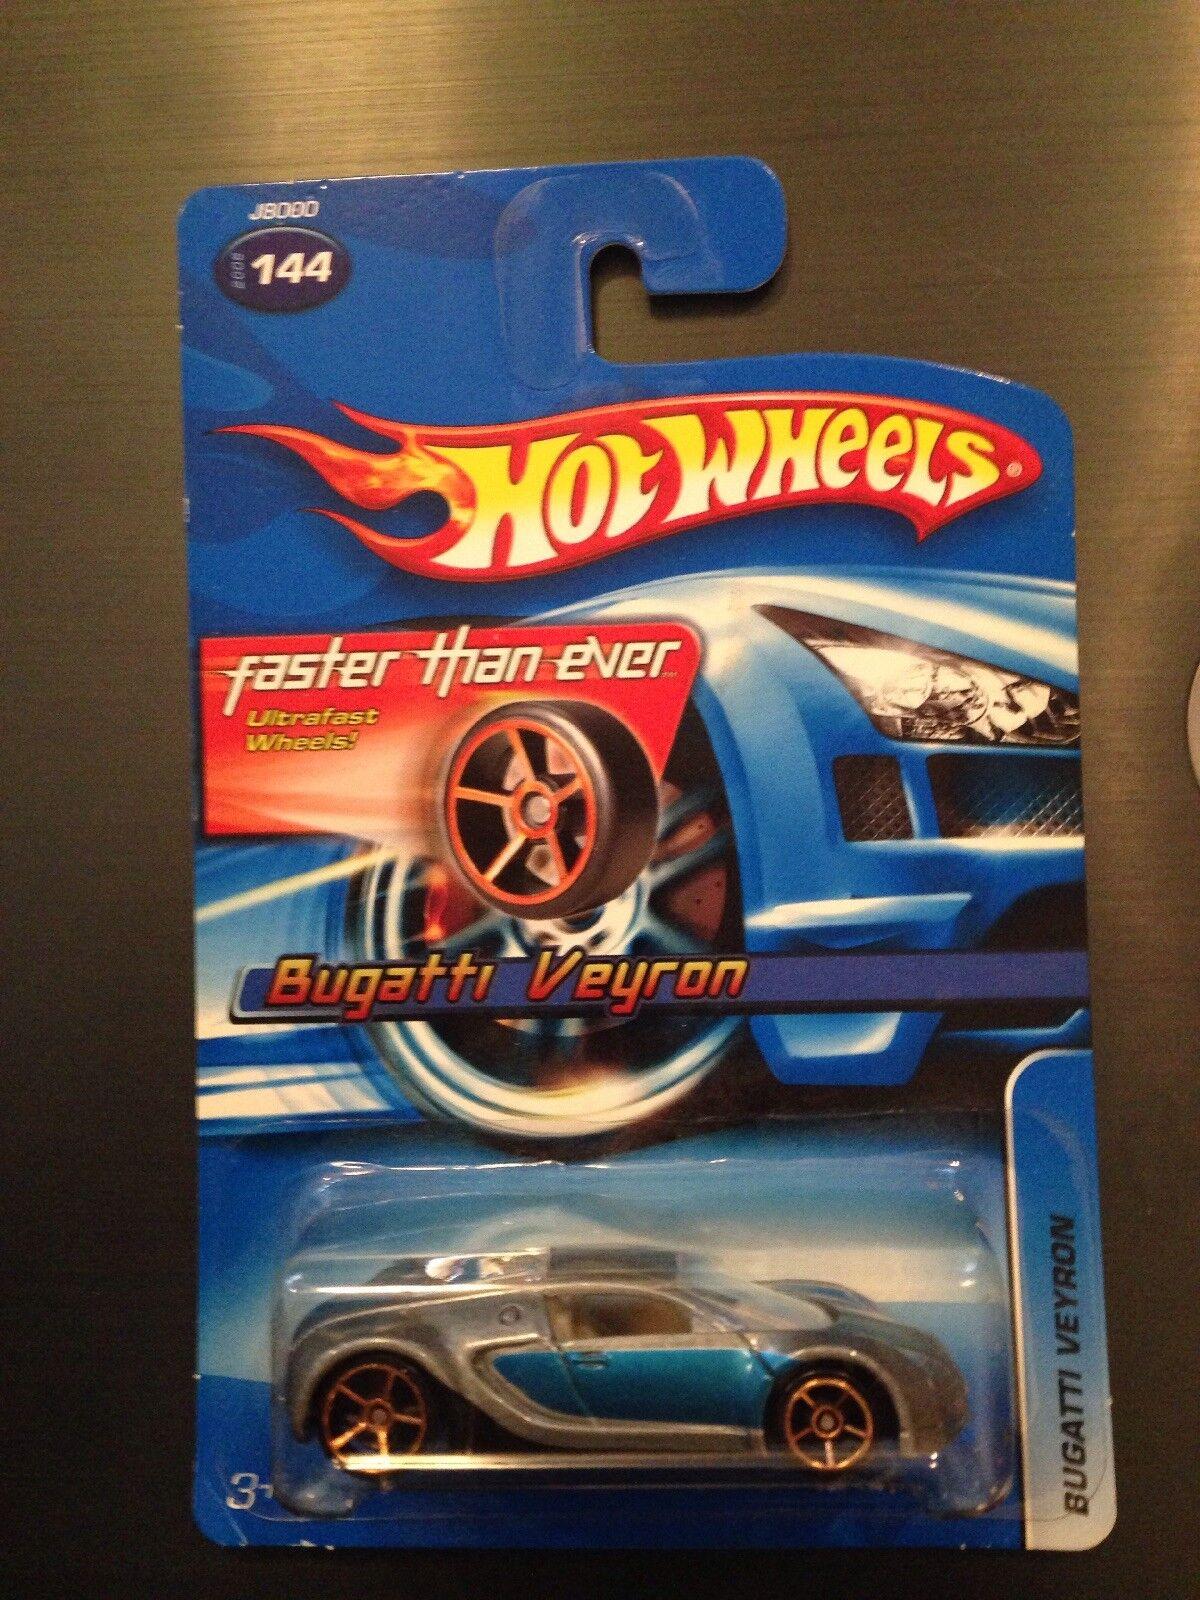 2006 Hot Wheels FTE Bugatti Veyron  144 Faster Than Ever diecast